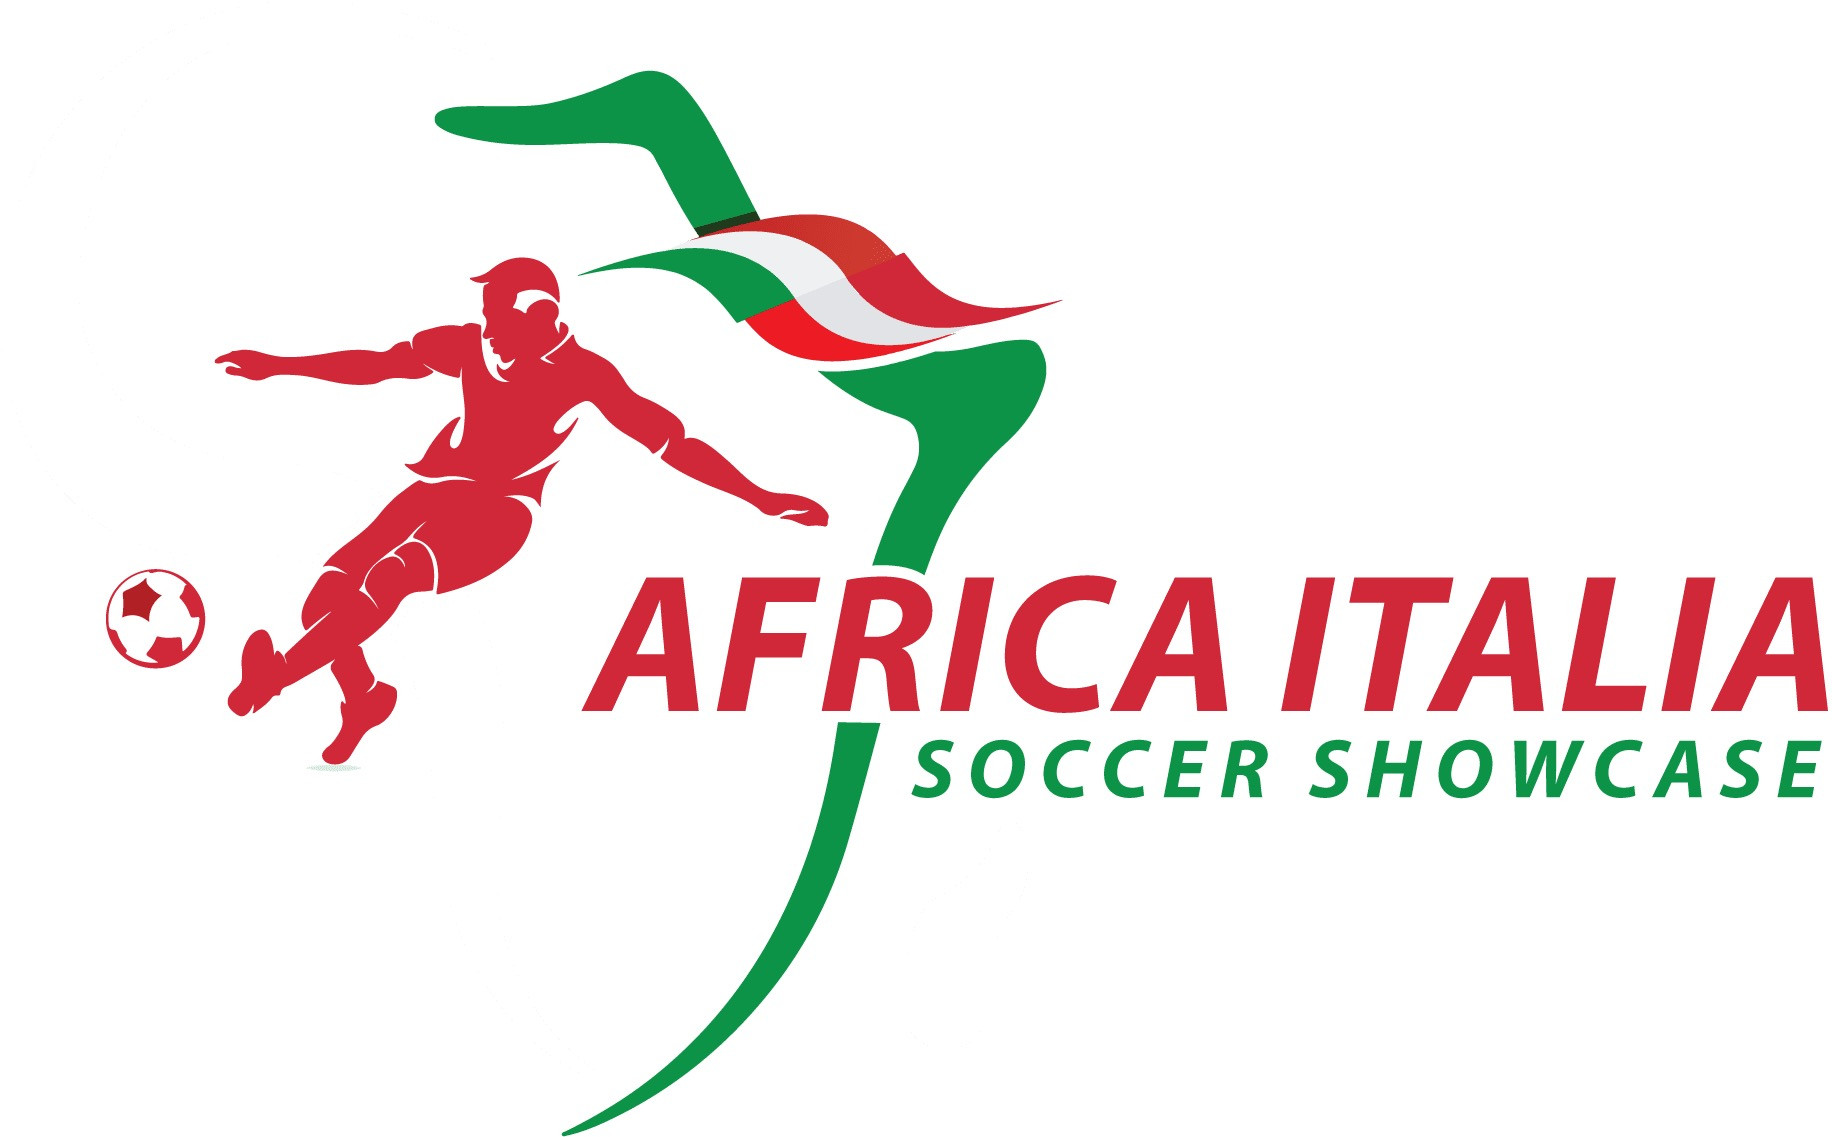 Africa Italia Trials - Johannesburg